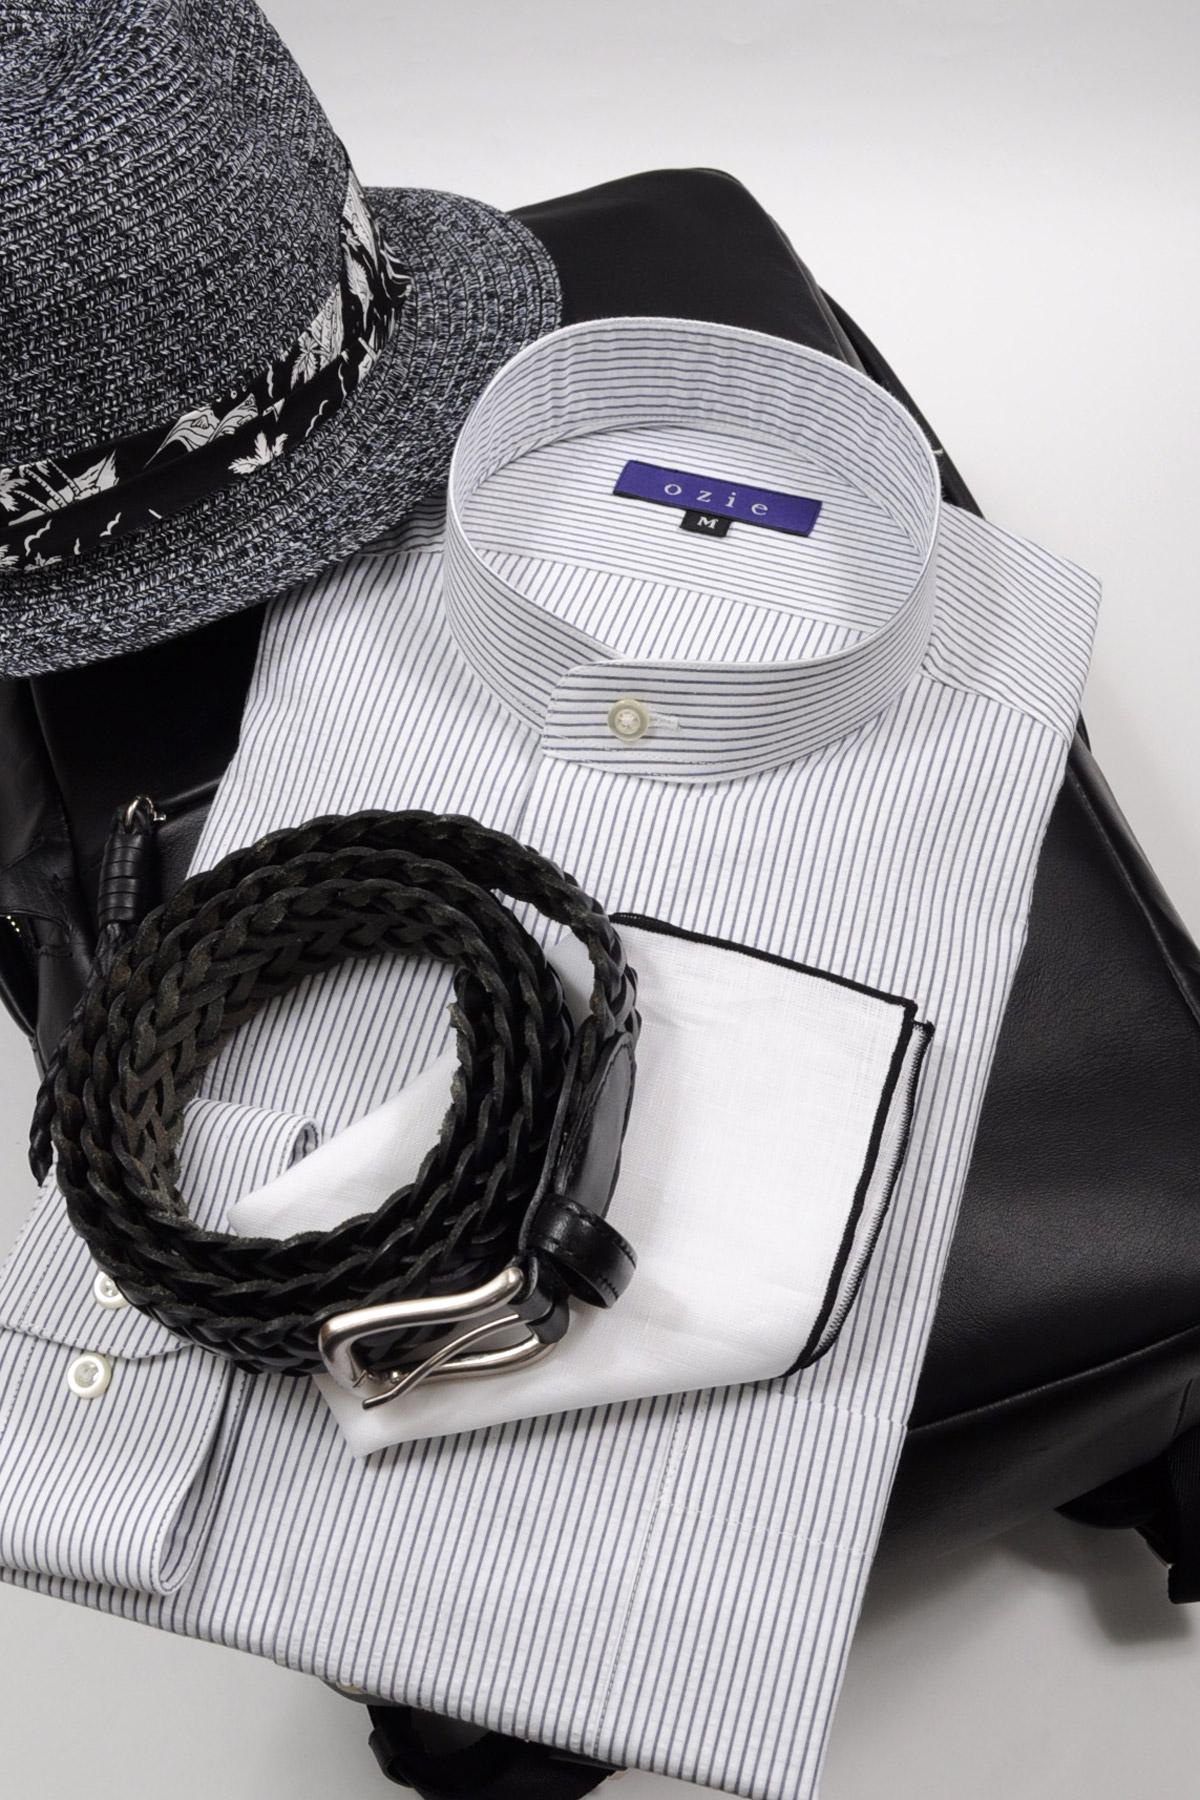 ozie|オジエ スタンドカラーシャツ・コーディネート